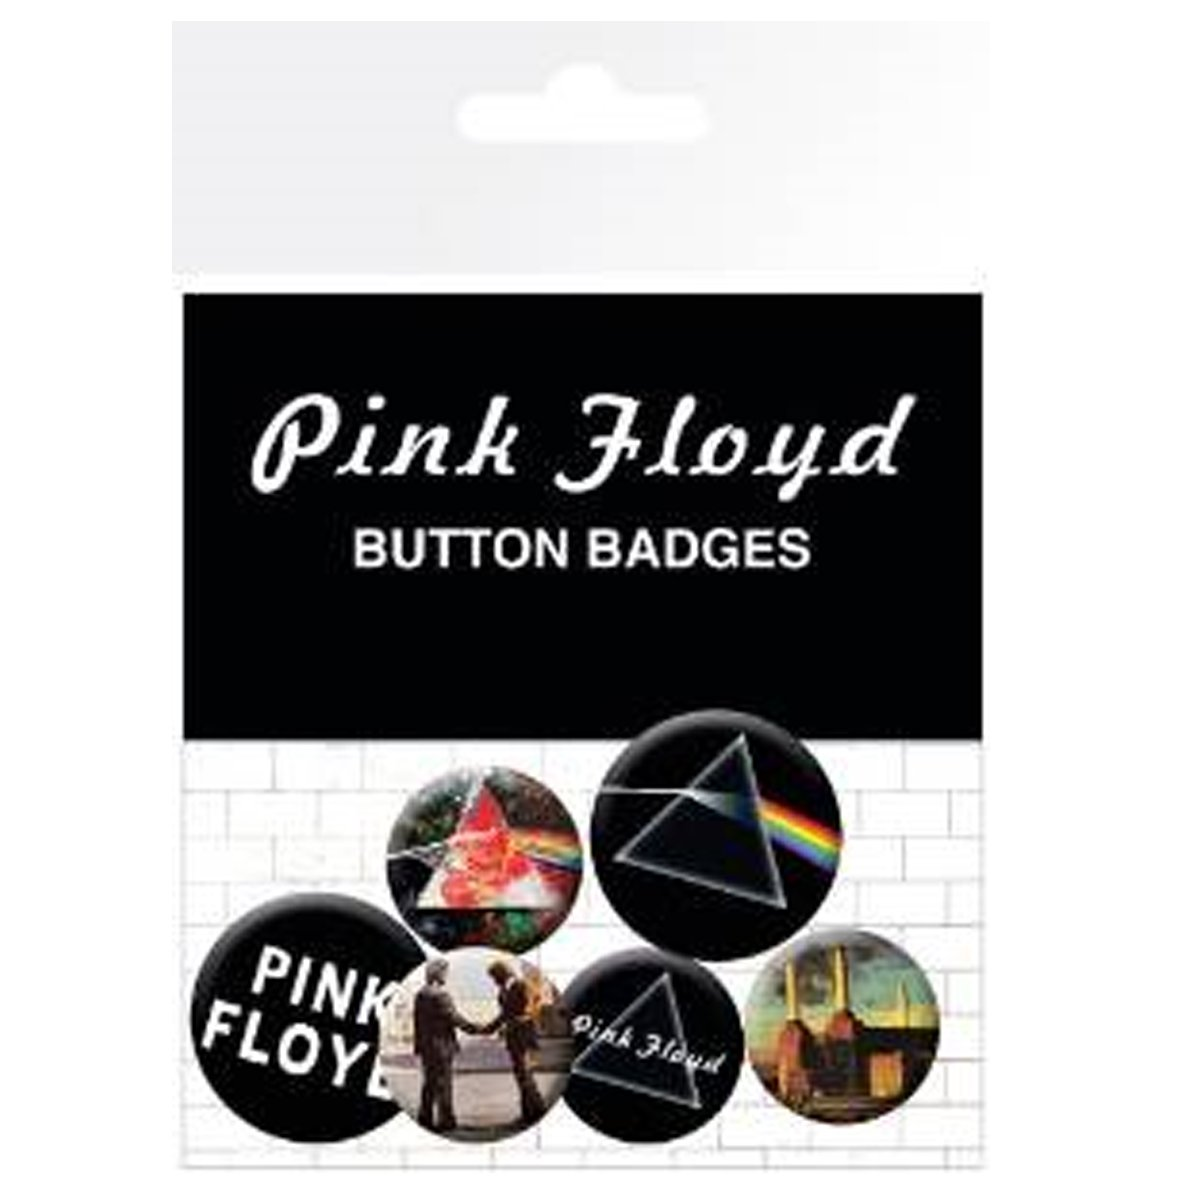 GB eye LTD, Pink floyd button badges BP0457